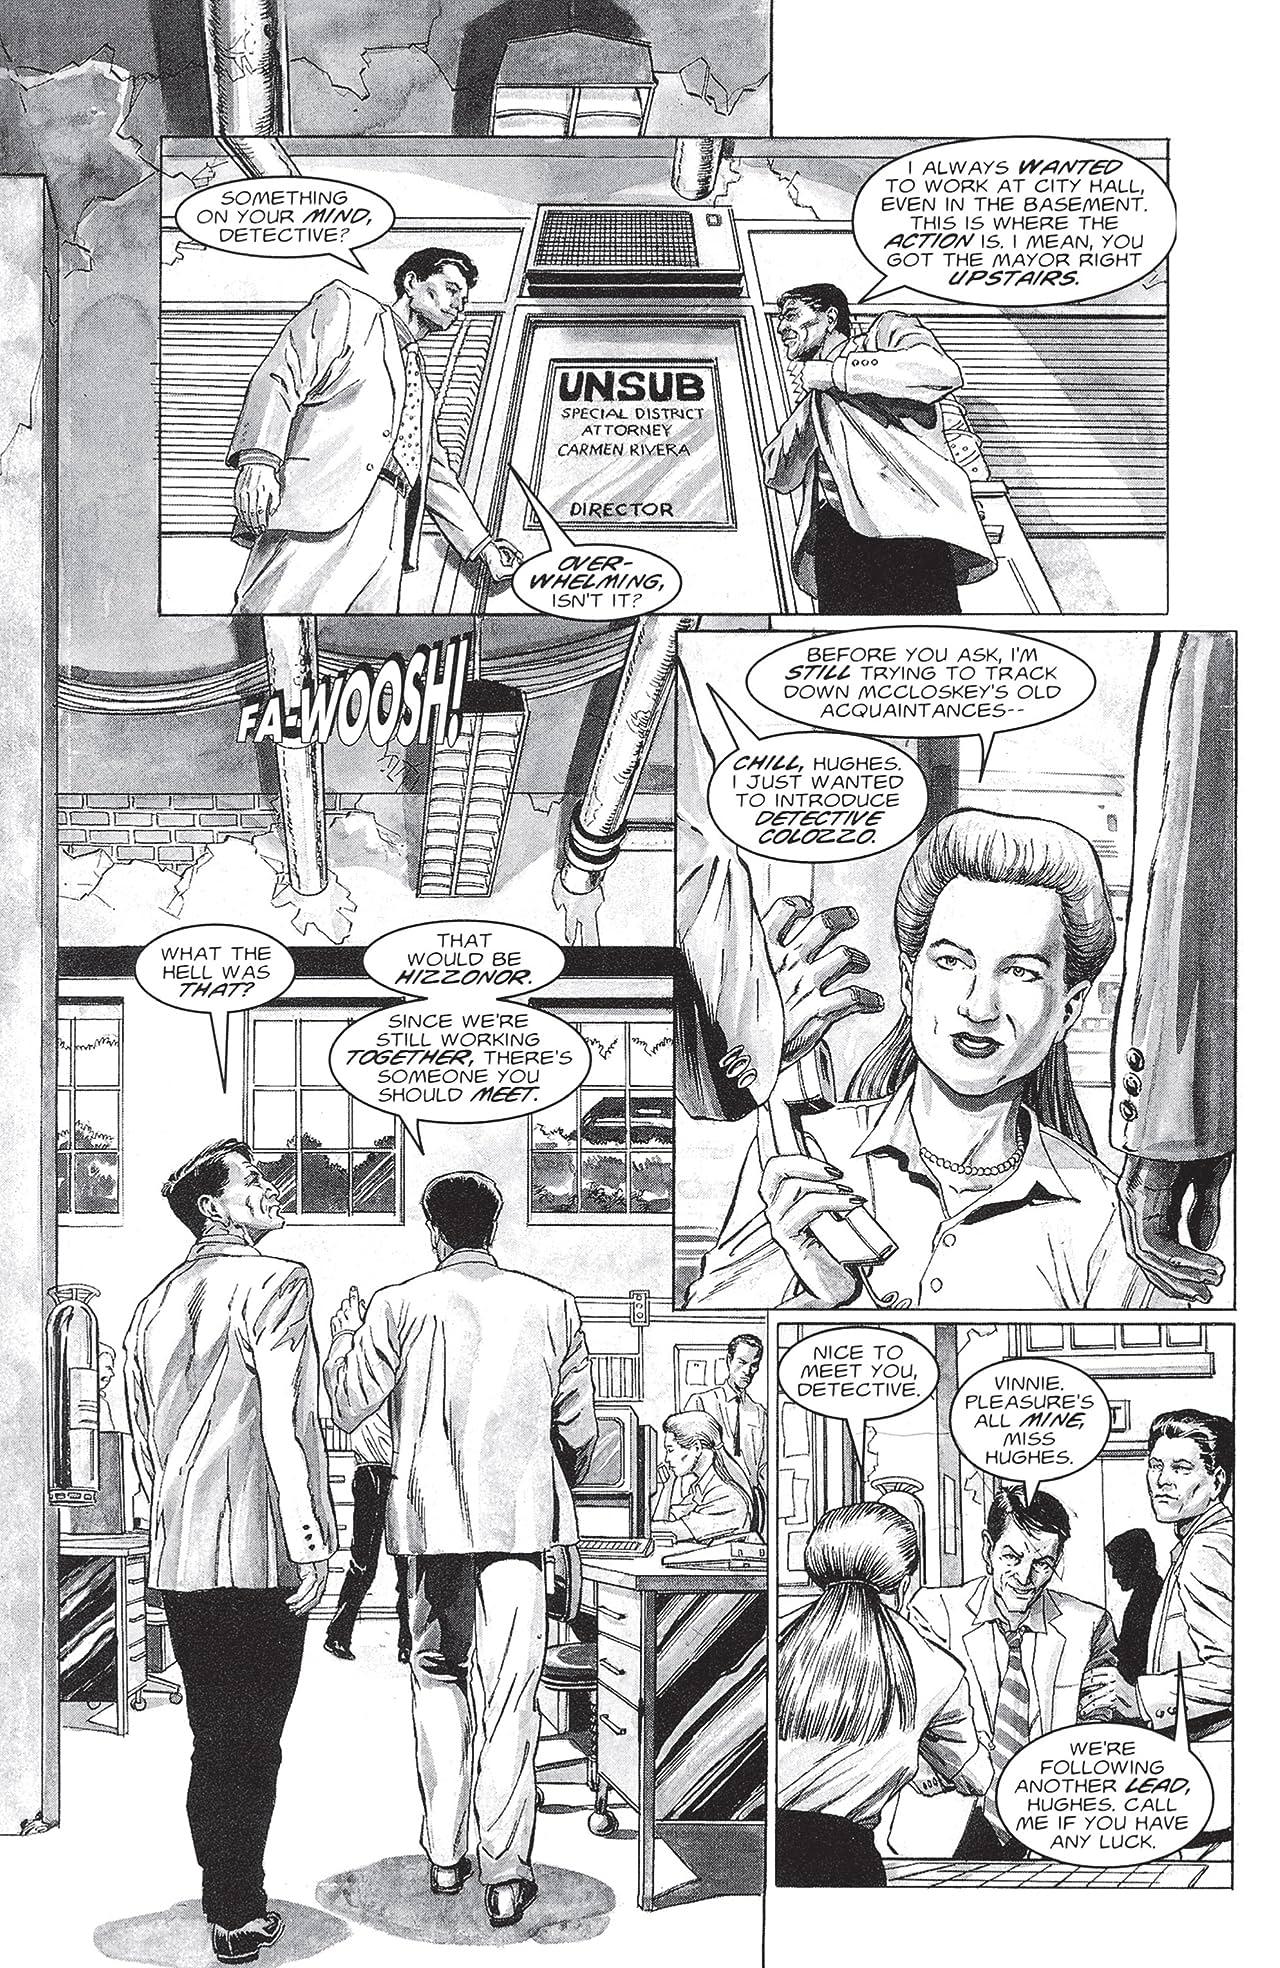 Gravediggers (1996) #2